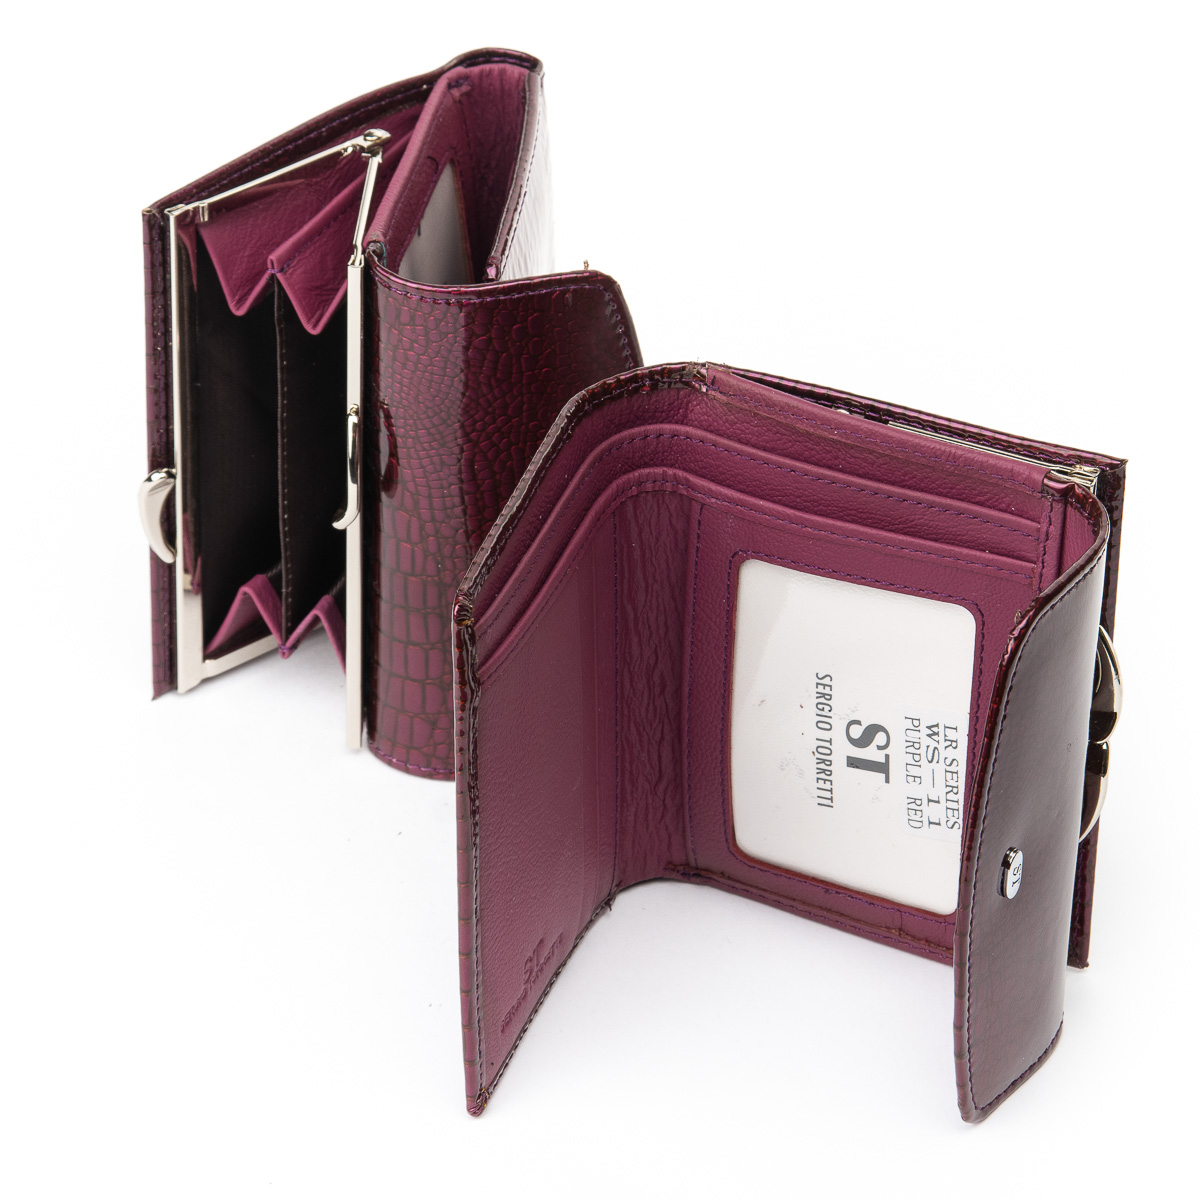 Кошелек LR кожа-лак SERGIO TORRETTI WS-11 purple-red